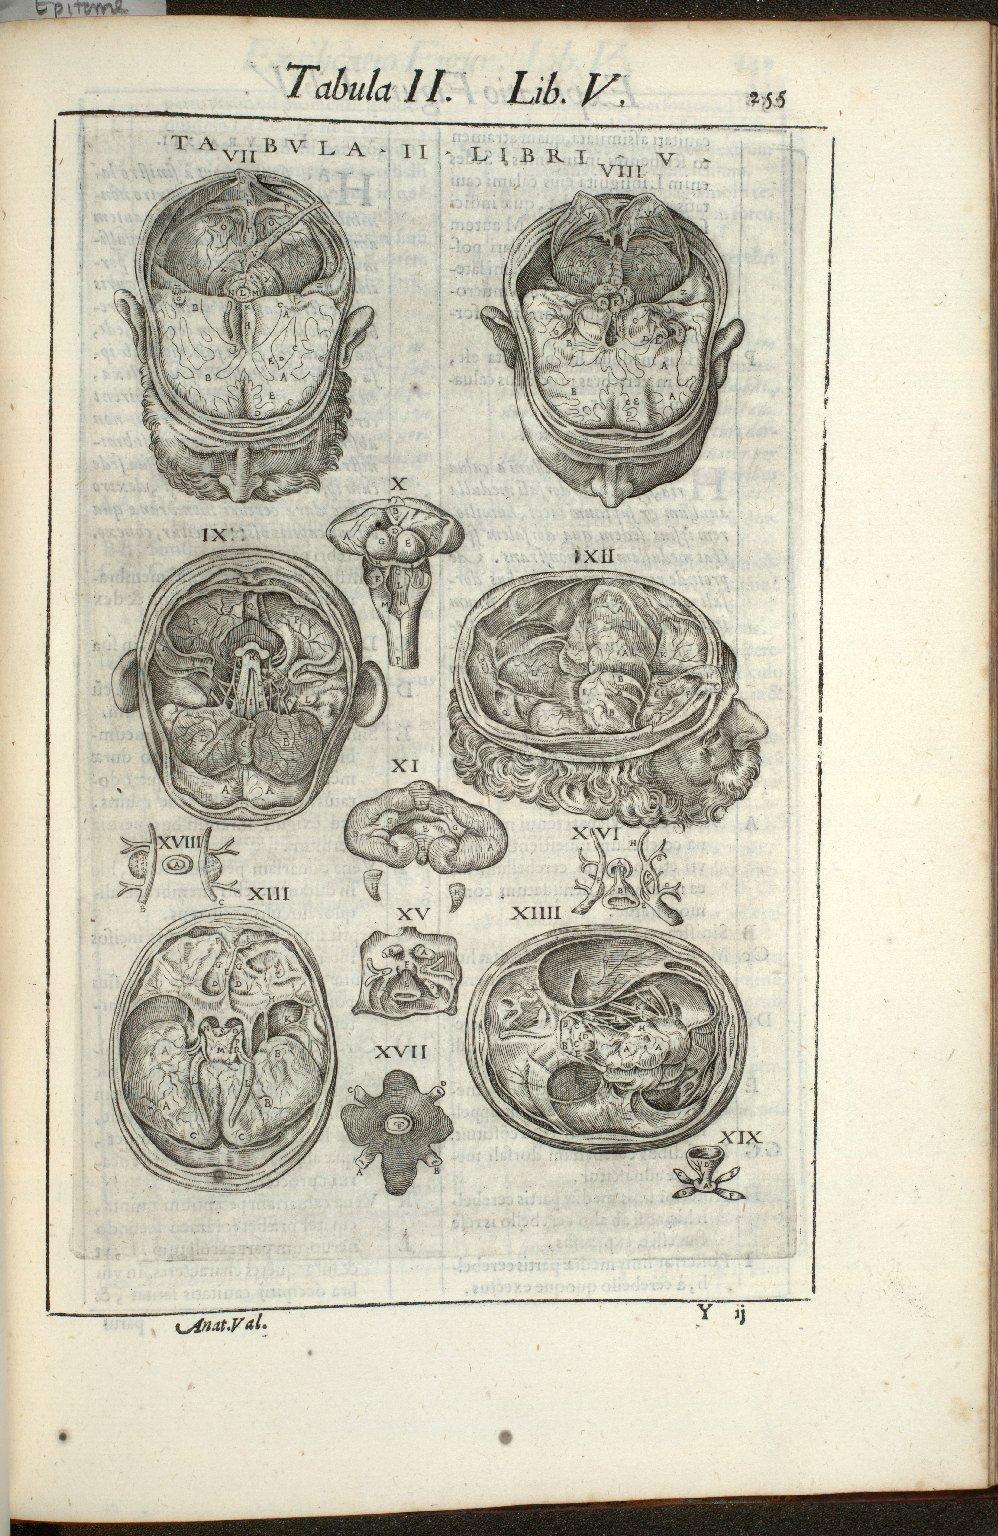 Tabula II. Libri V.